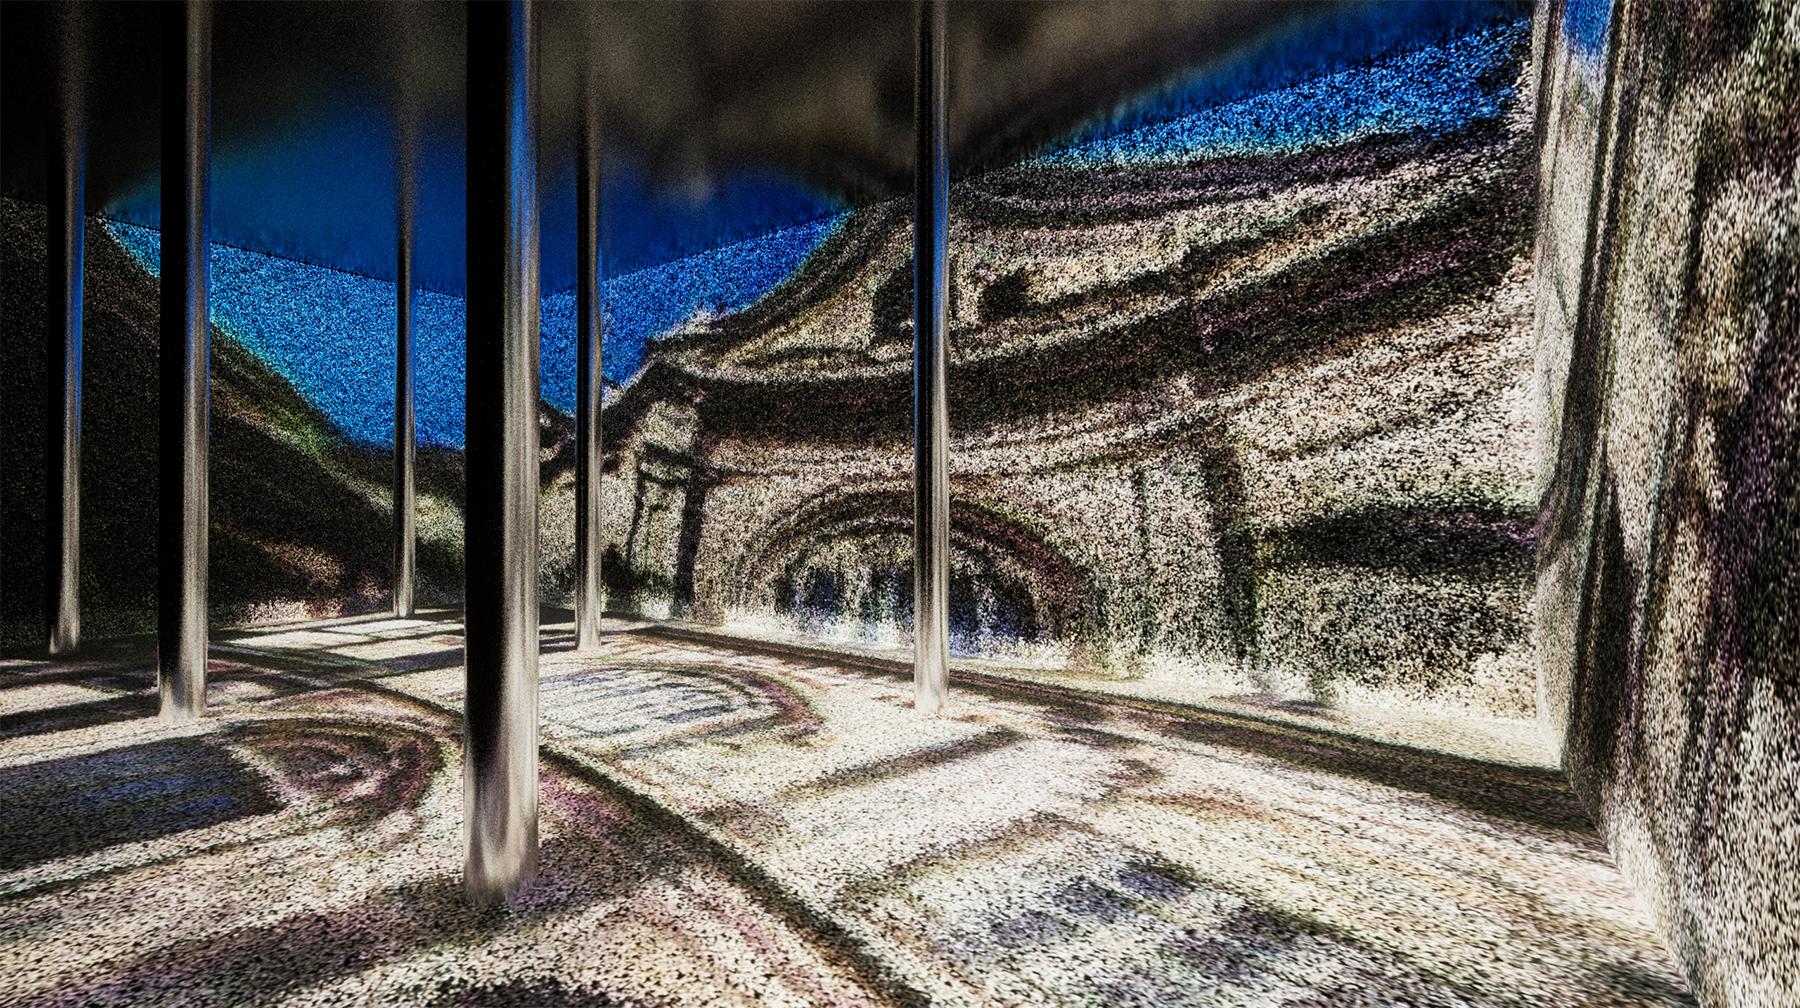 Enter Artechouse, NYC's Sprawling New Digital Art Mecca – SURFACE